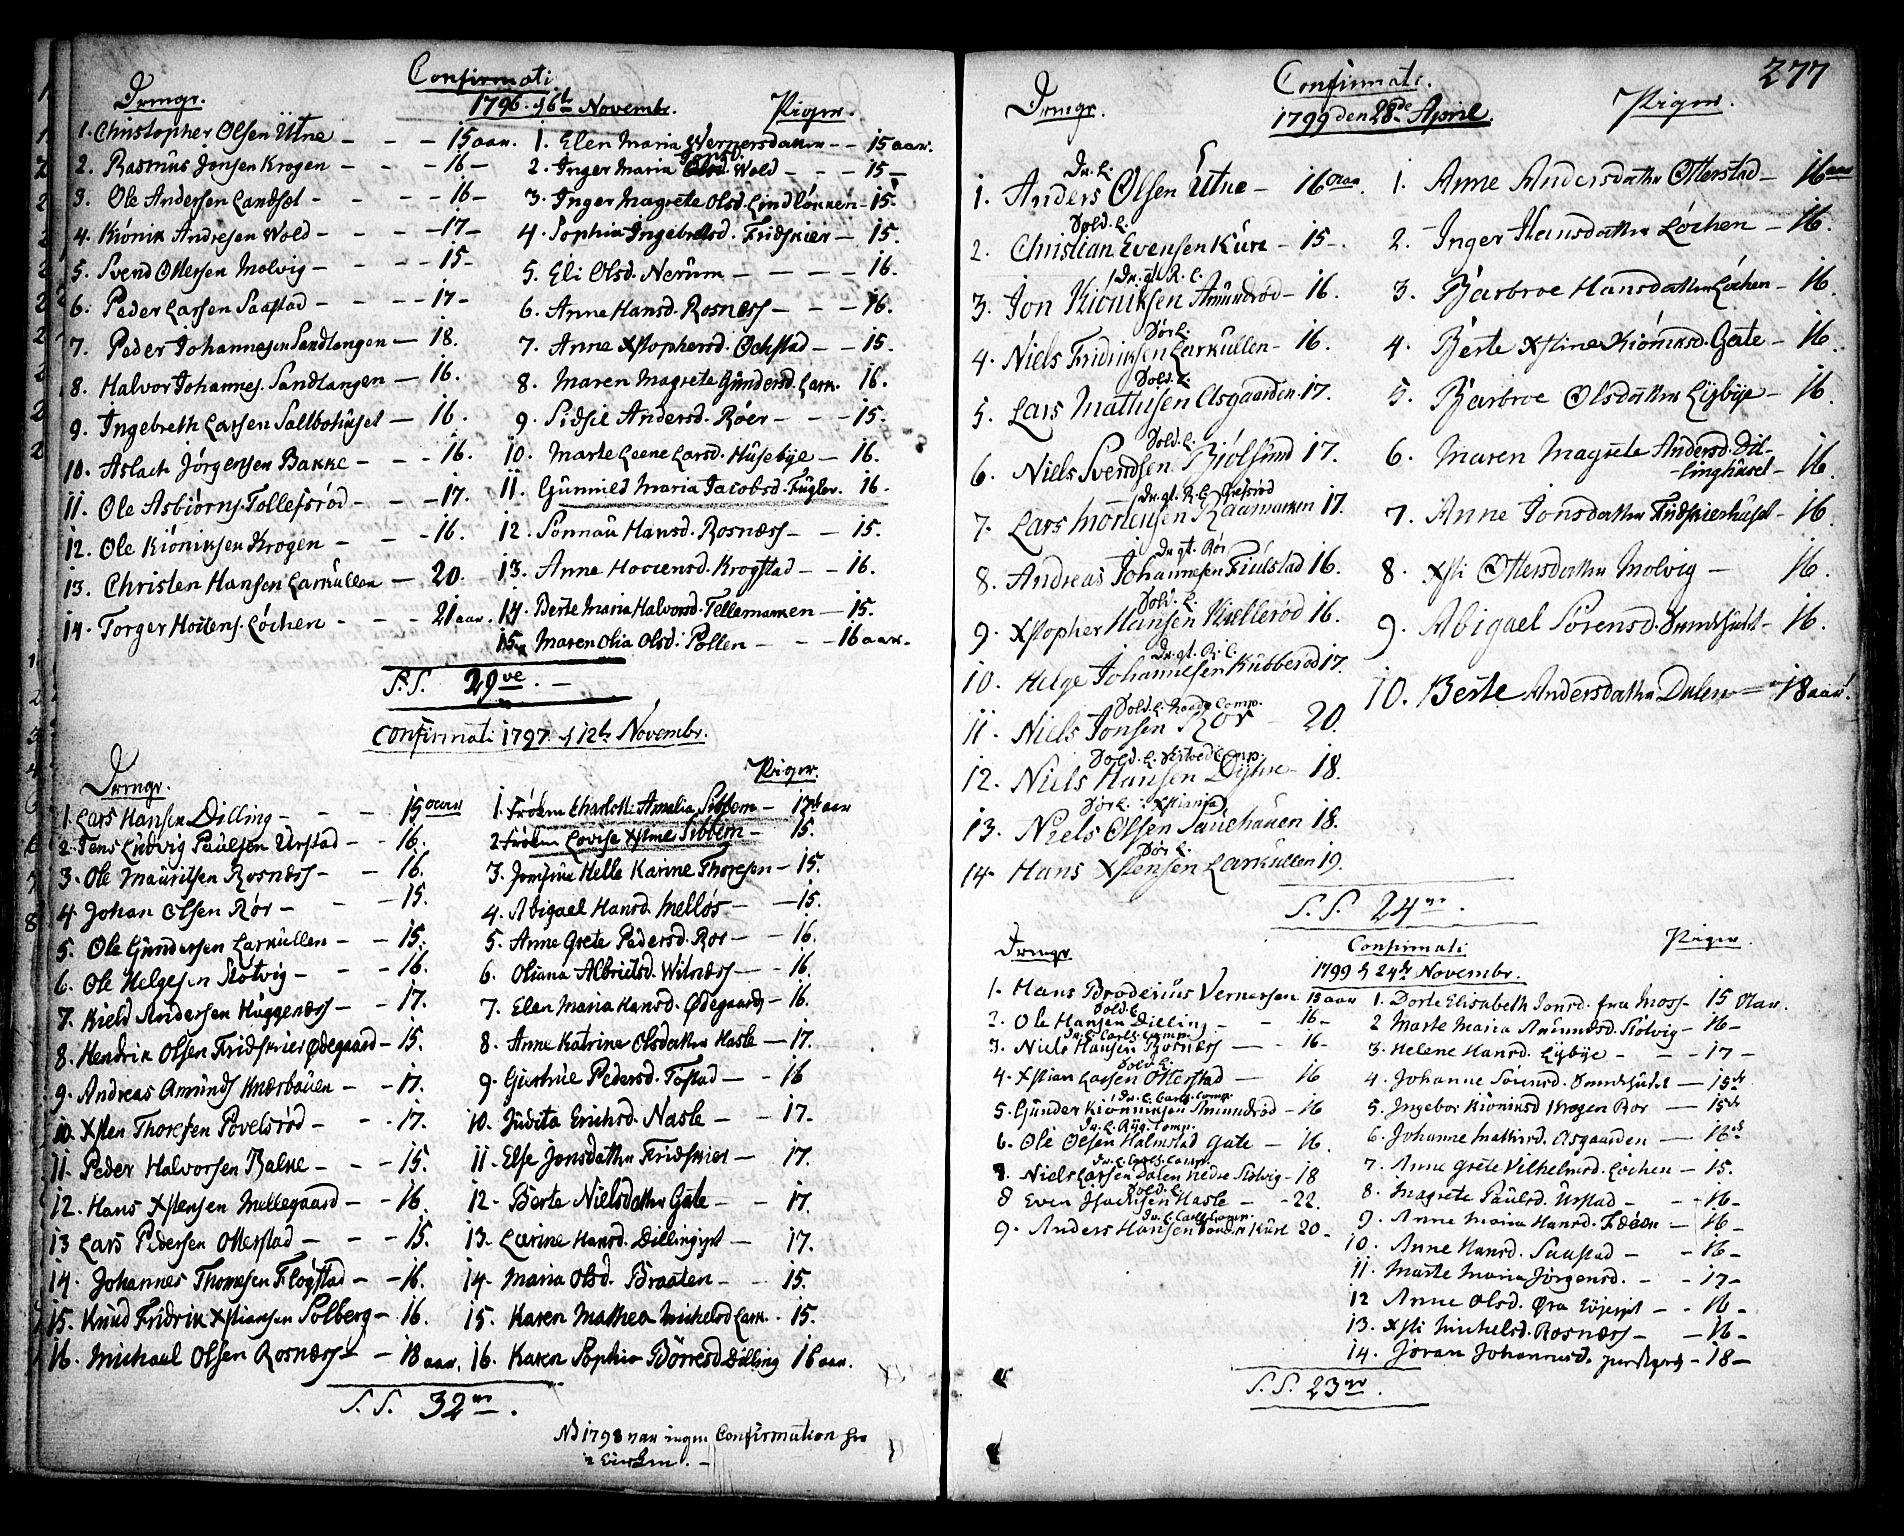 SAO, Rygge prestekontor Kirkebøker, F/Fa/L0002: Parish register (official) no. 2, 1771-1814, p. 277